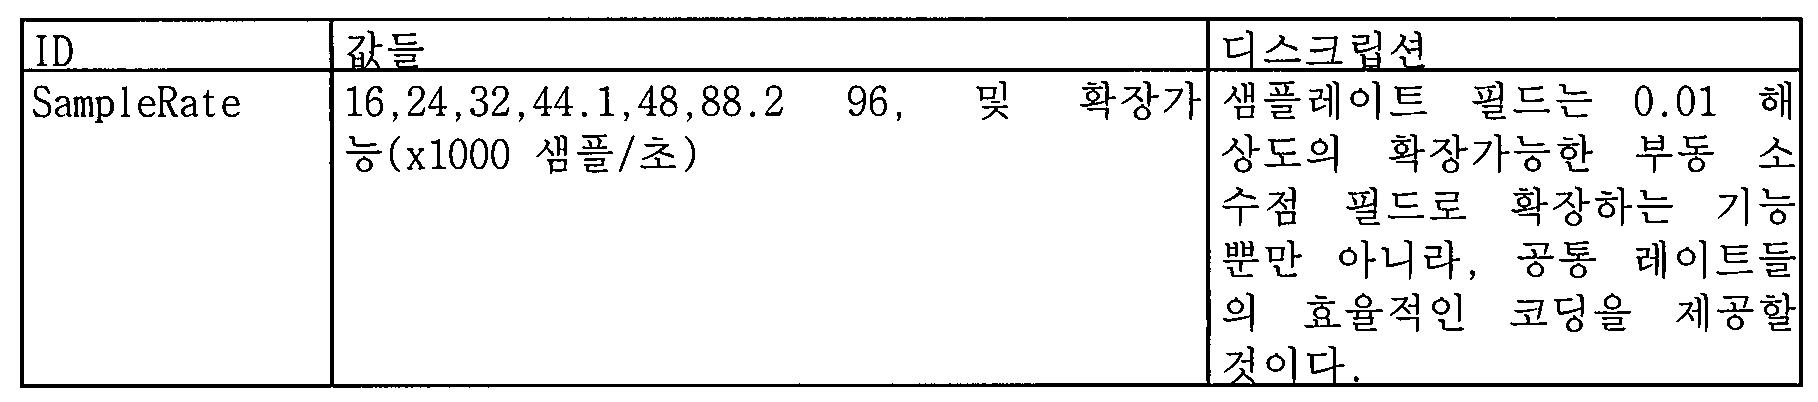 Figure 112014128070760-pat00005